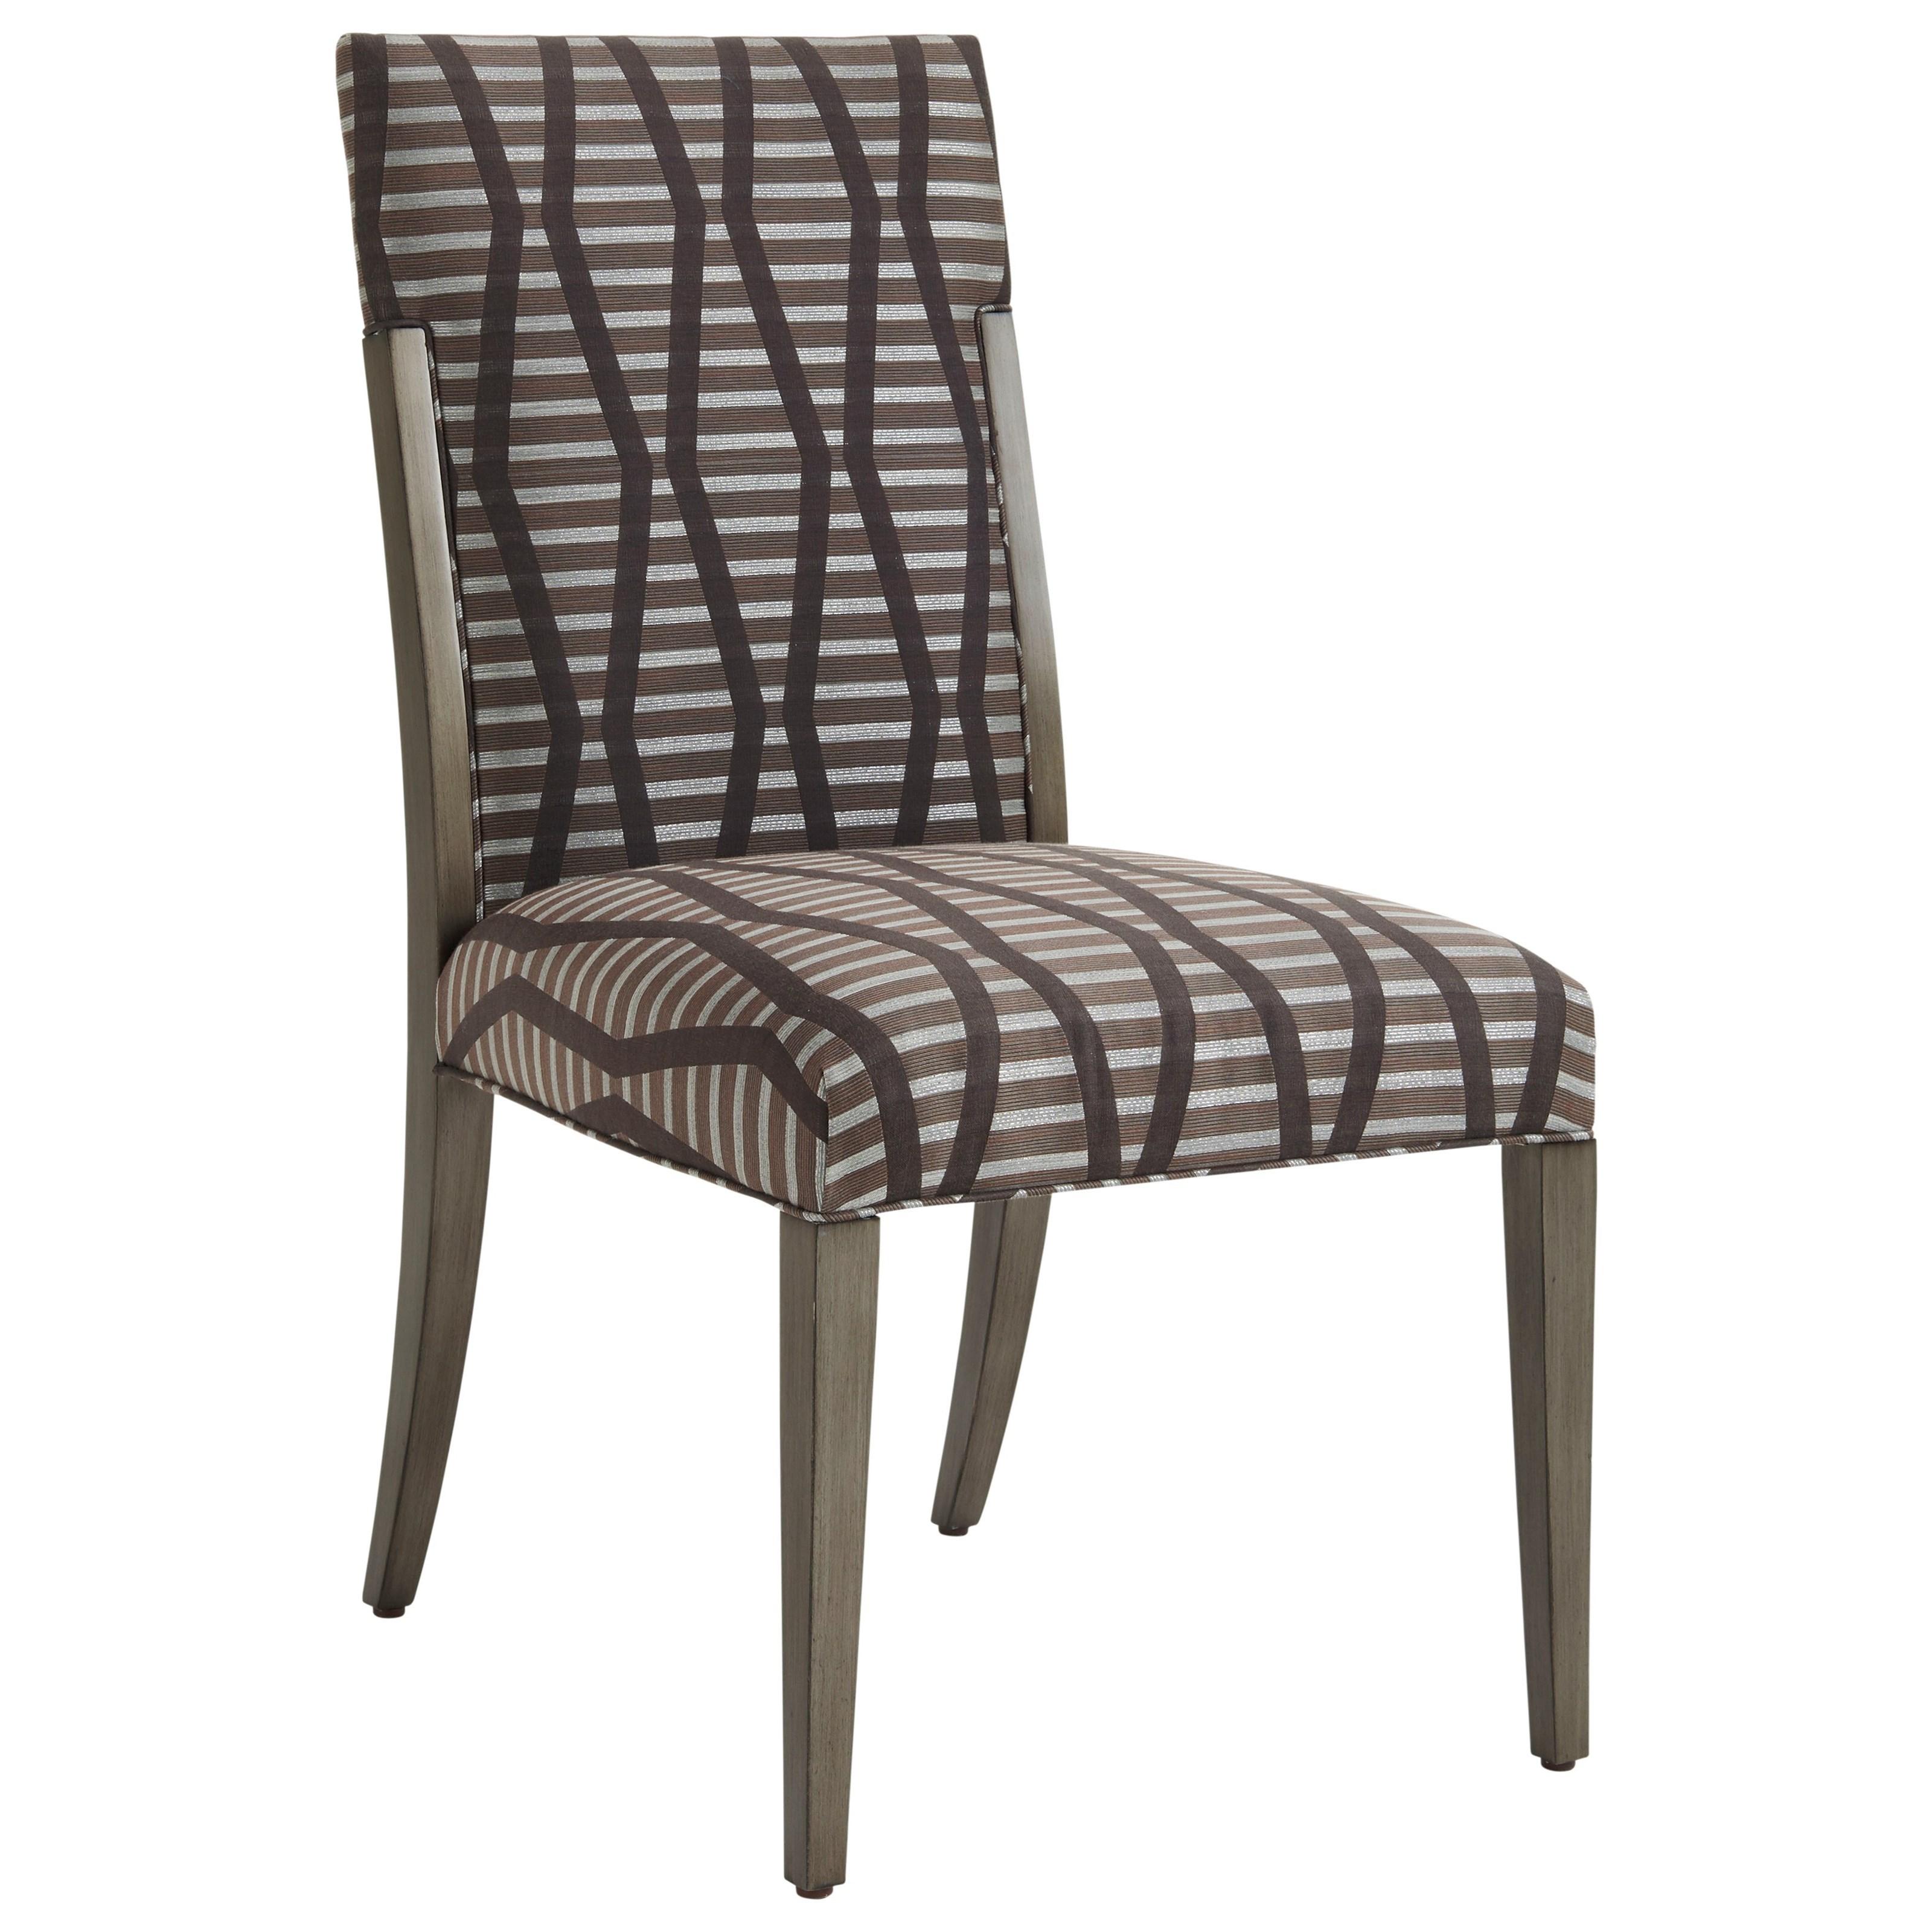 Lexington Ariana Saverne Custom Upholstered Side Chair